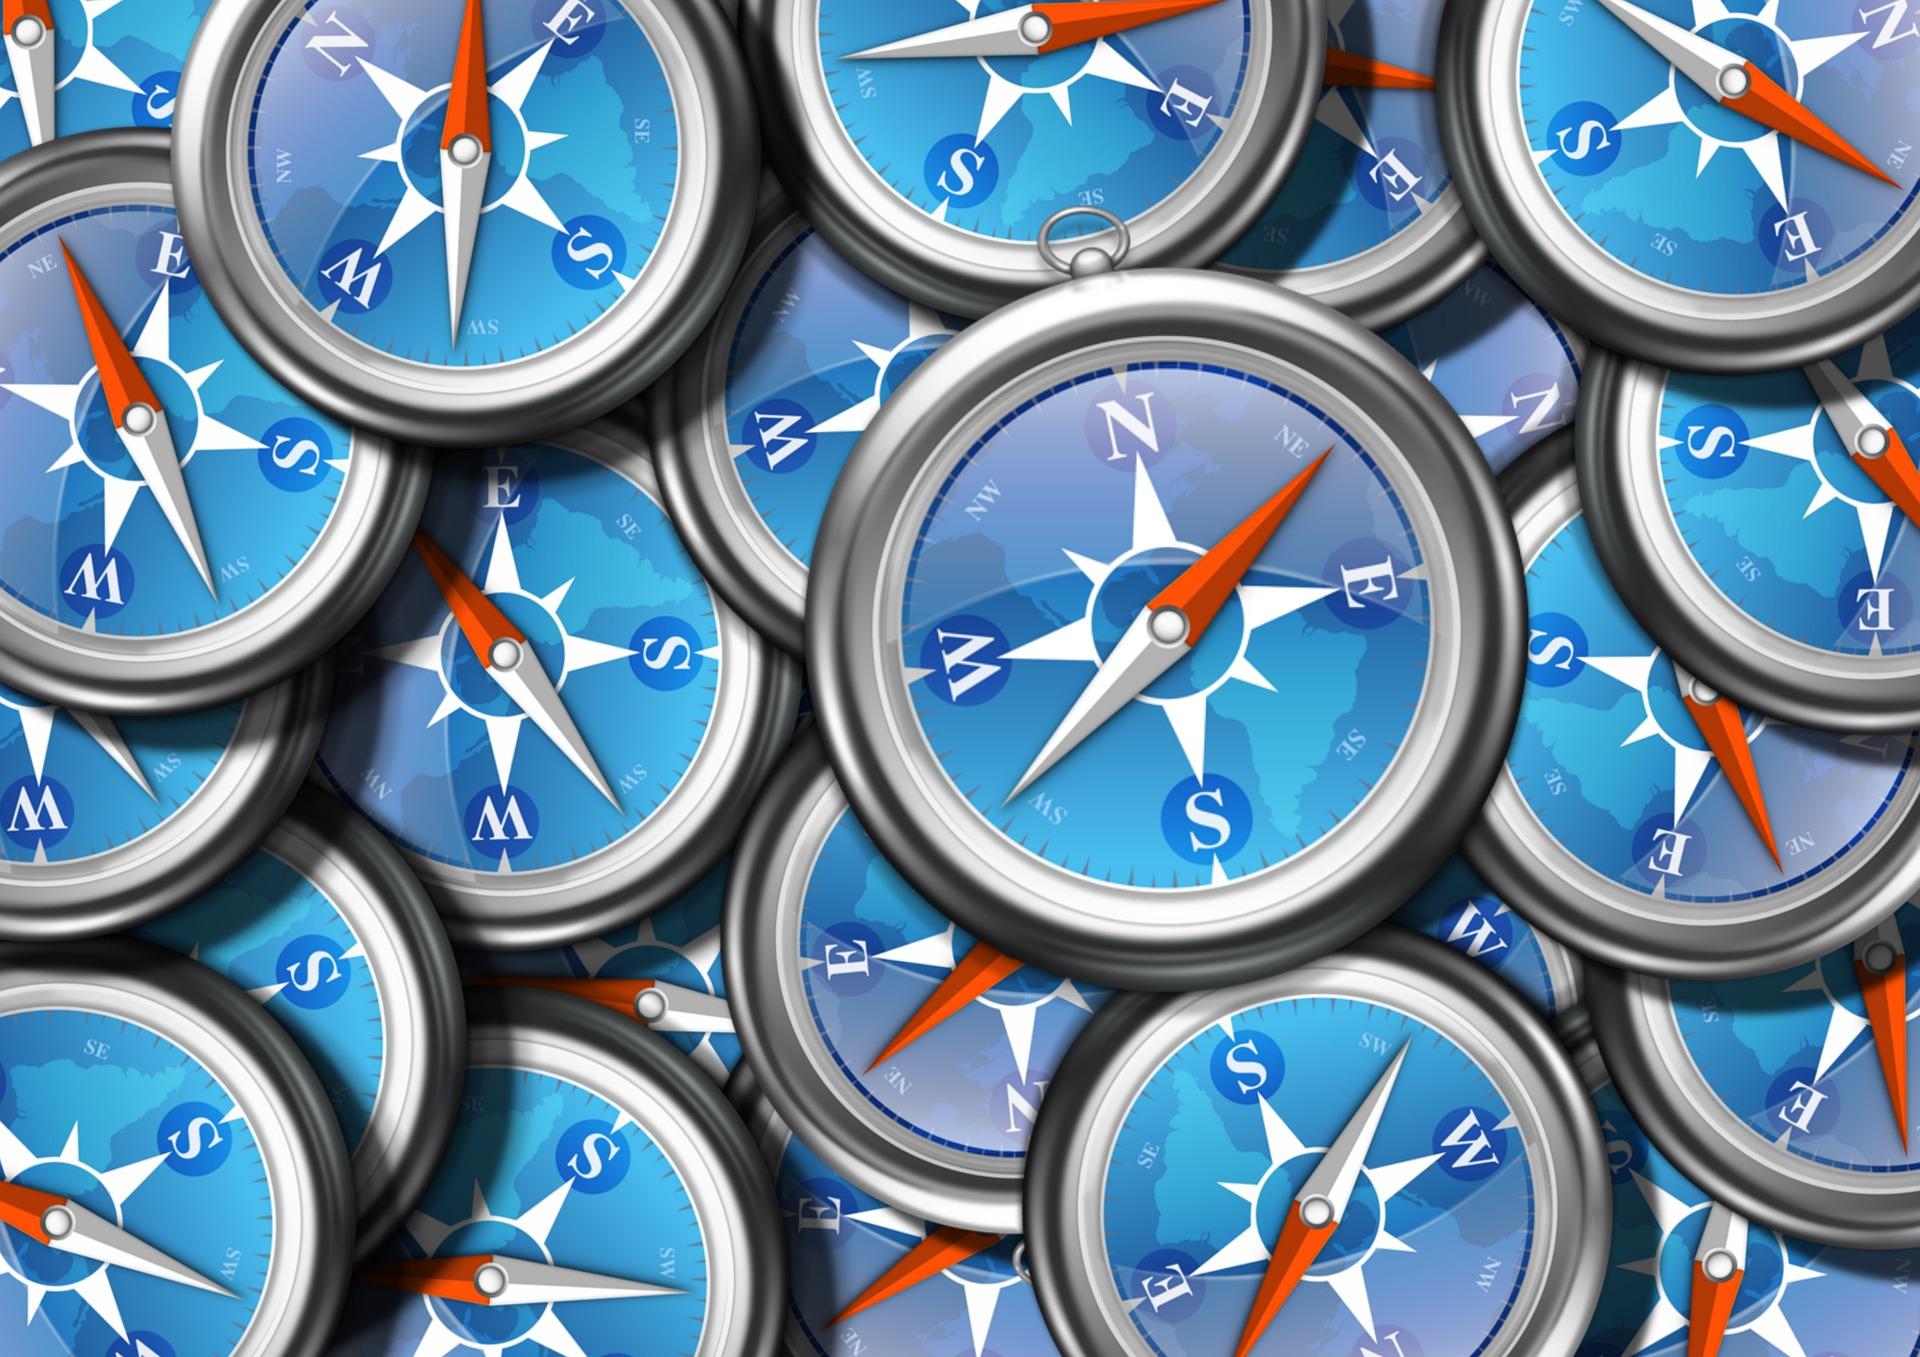 Ventajas del navegador Safari